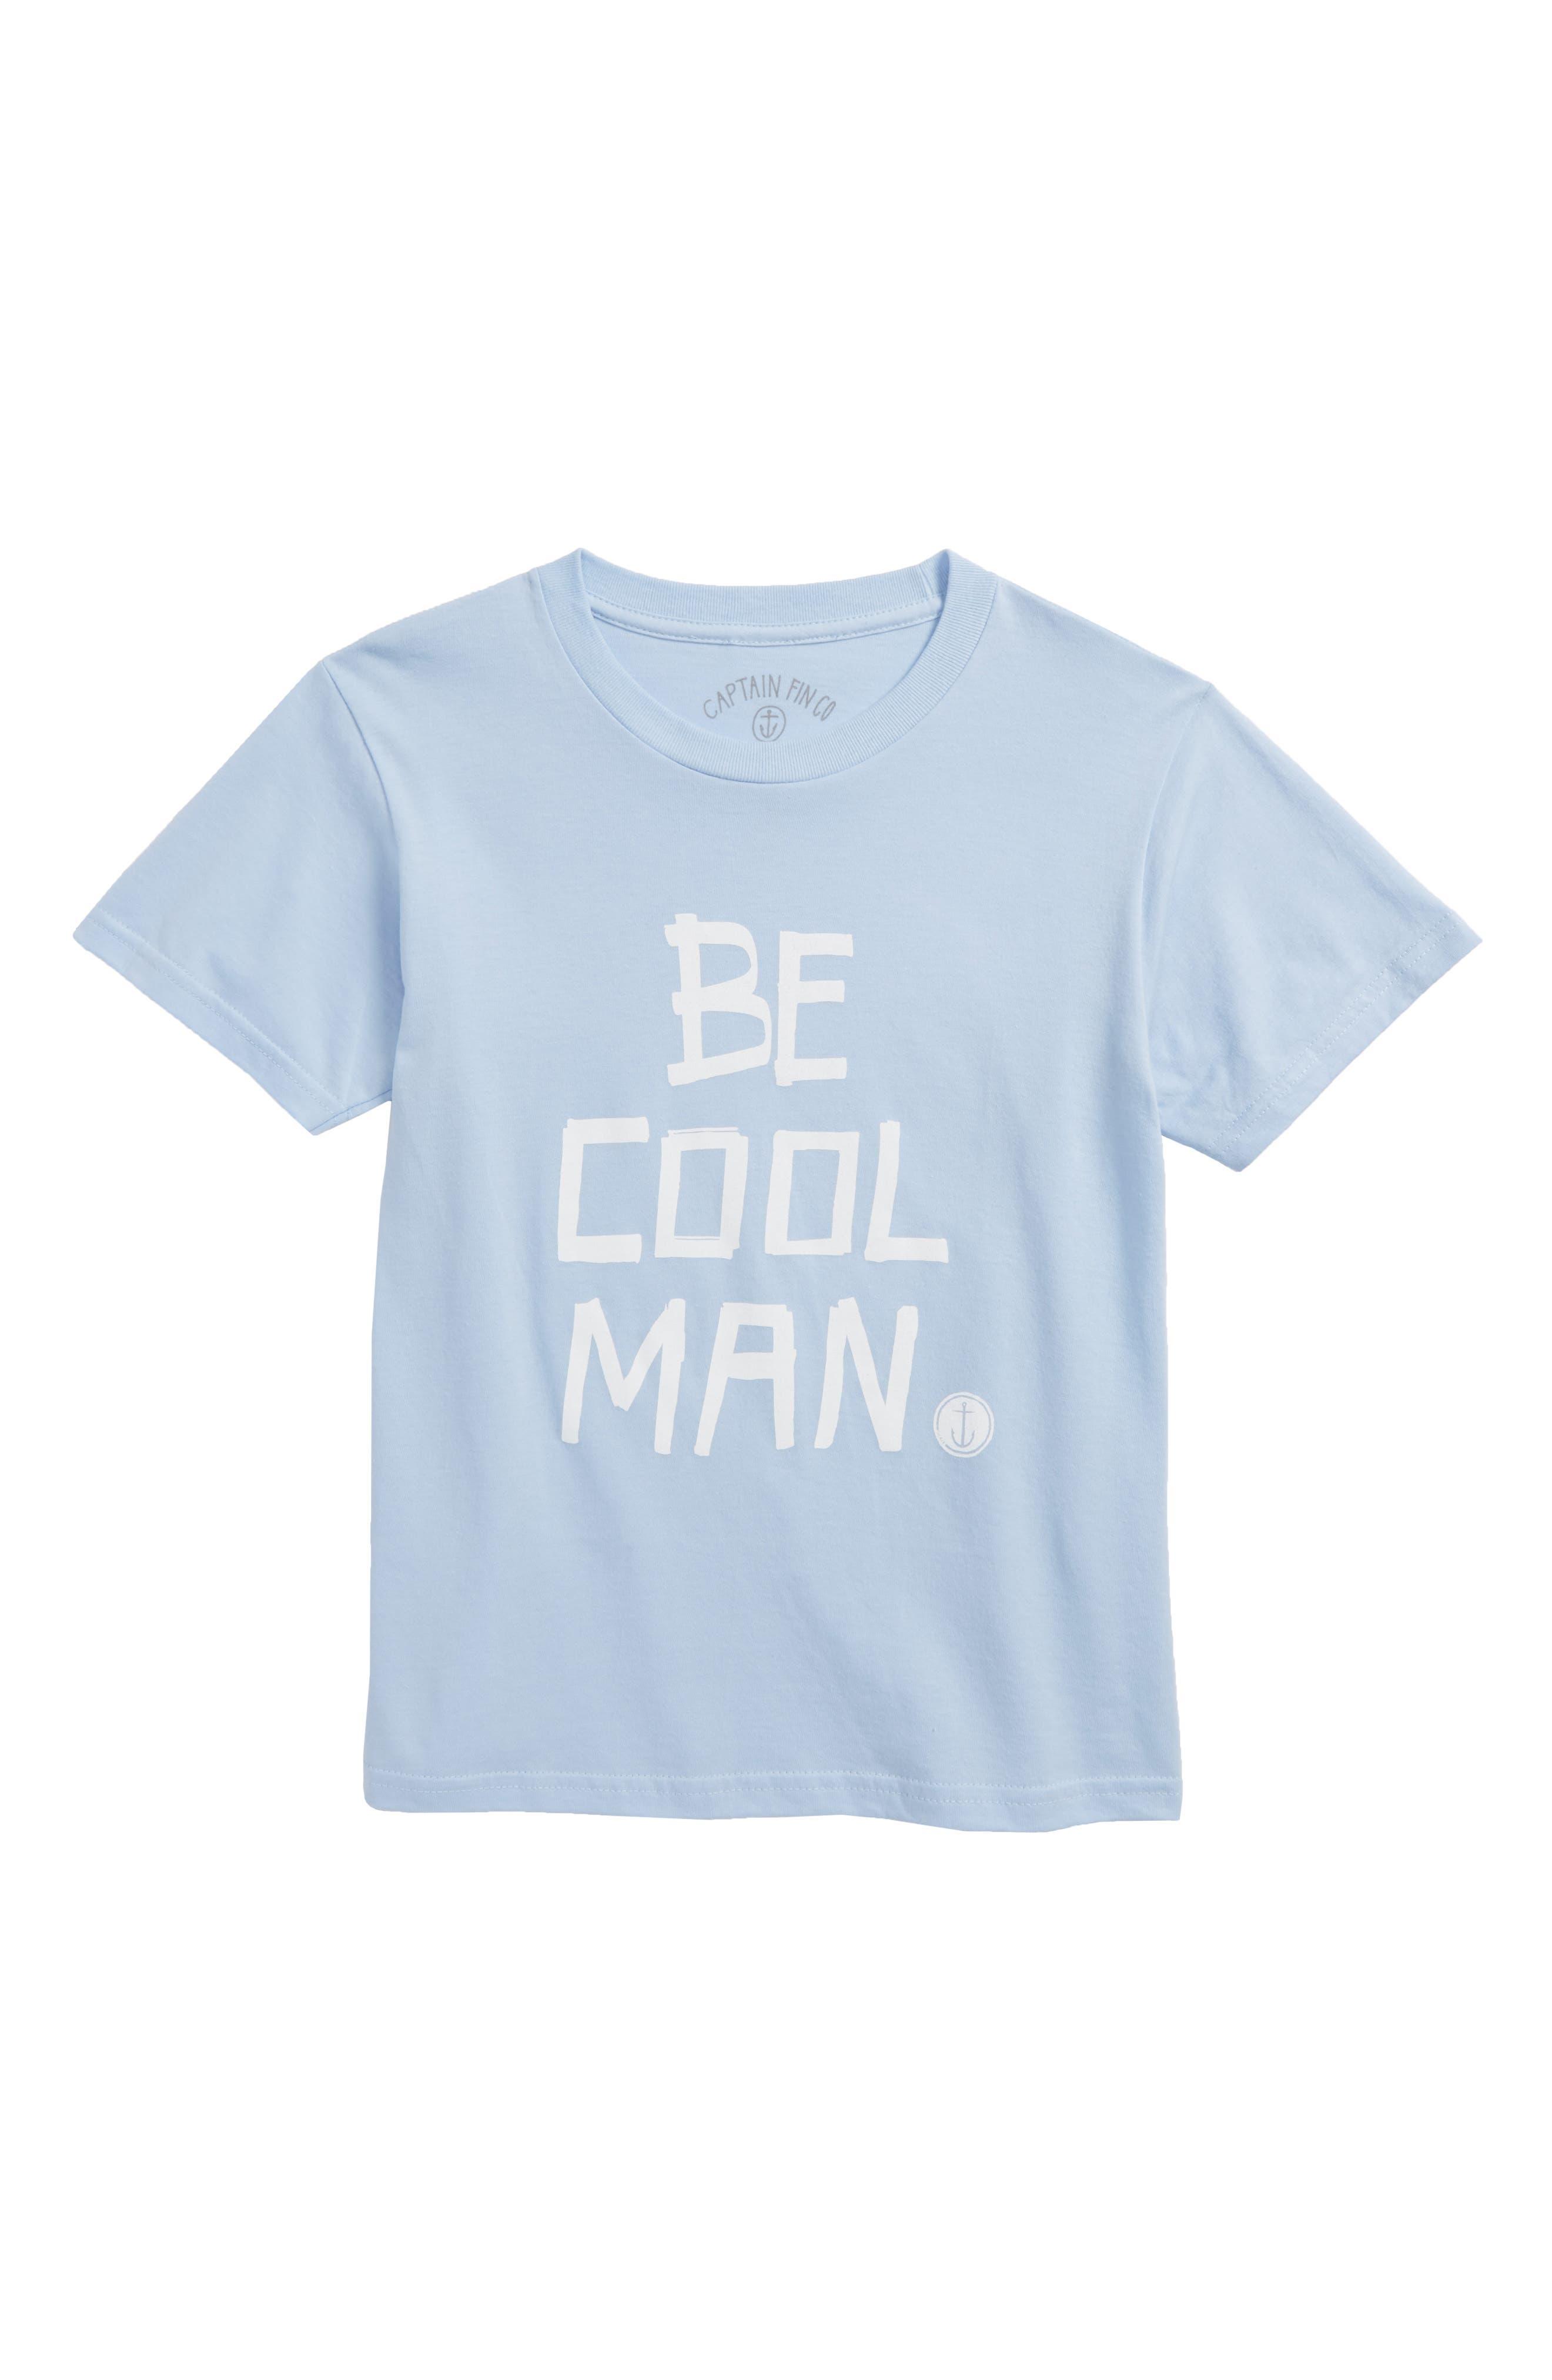 Captin Fin Be Cool Man Graphic T-Shirt (Big Boys)